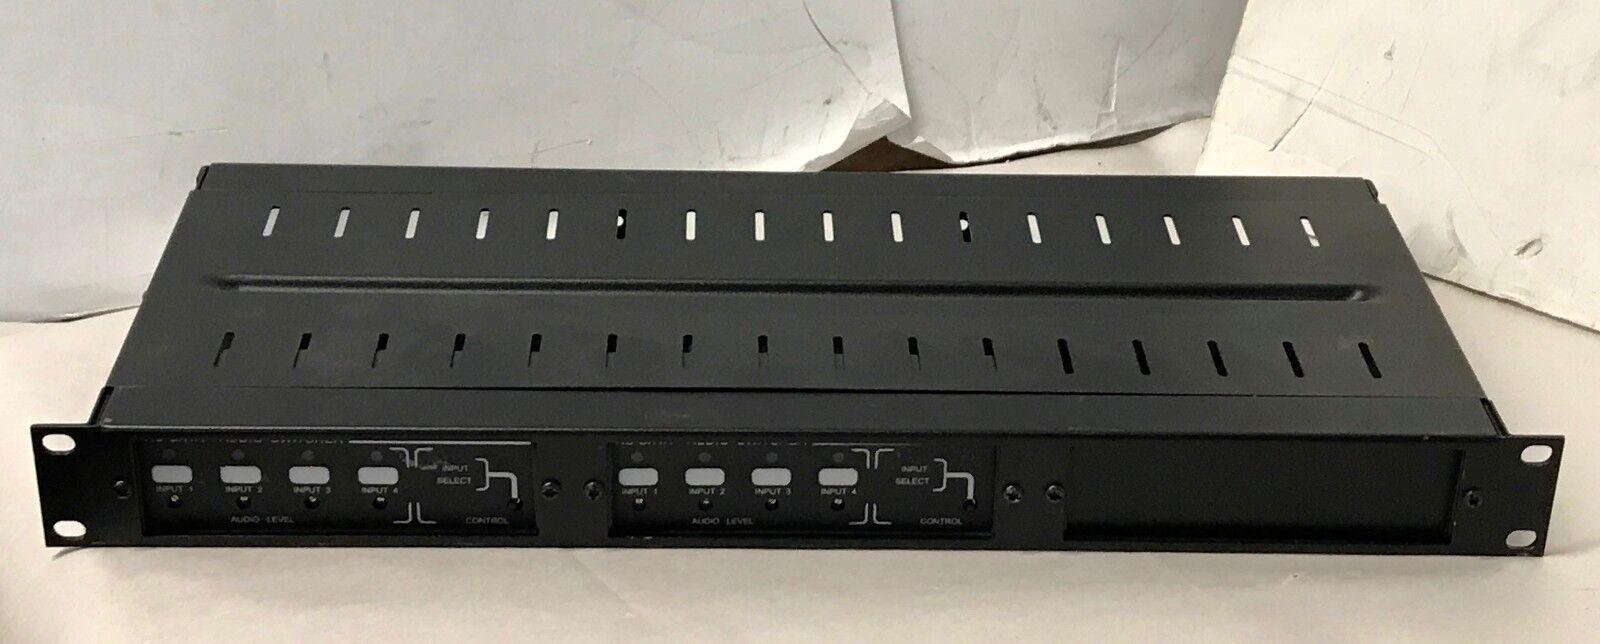 LOT OF 2  RDL RU-SX4A Balanced Audio Switcher w  enclosure ,Rack Mount